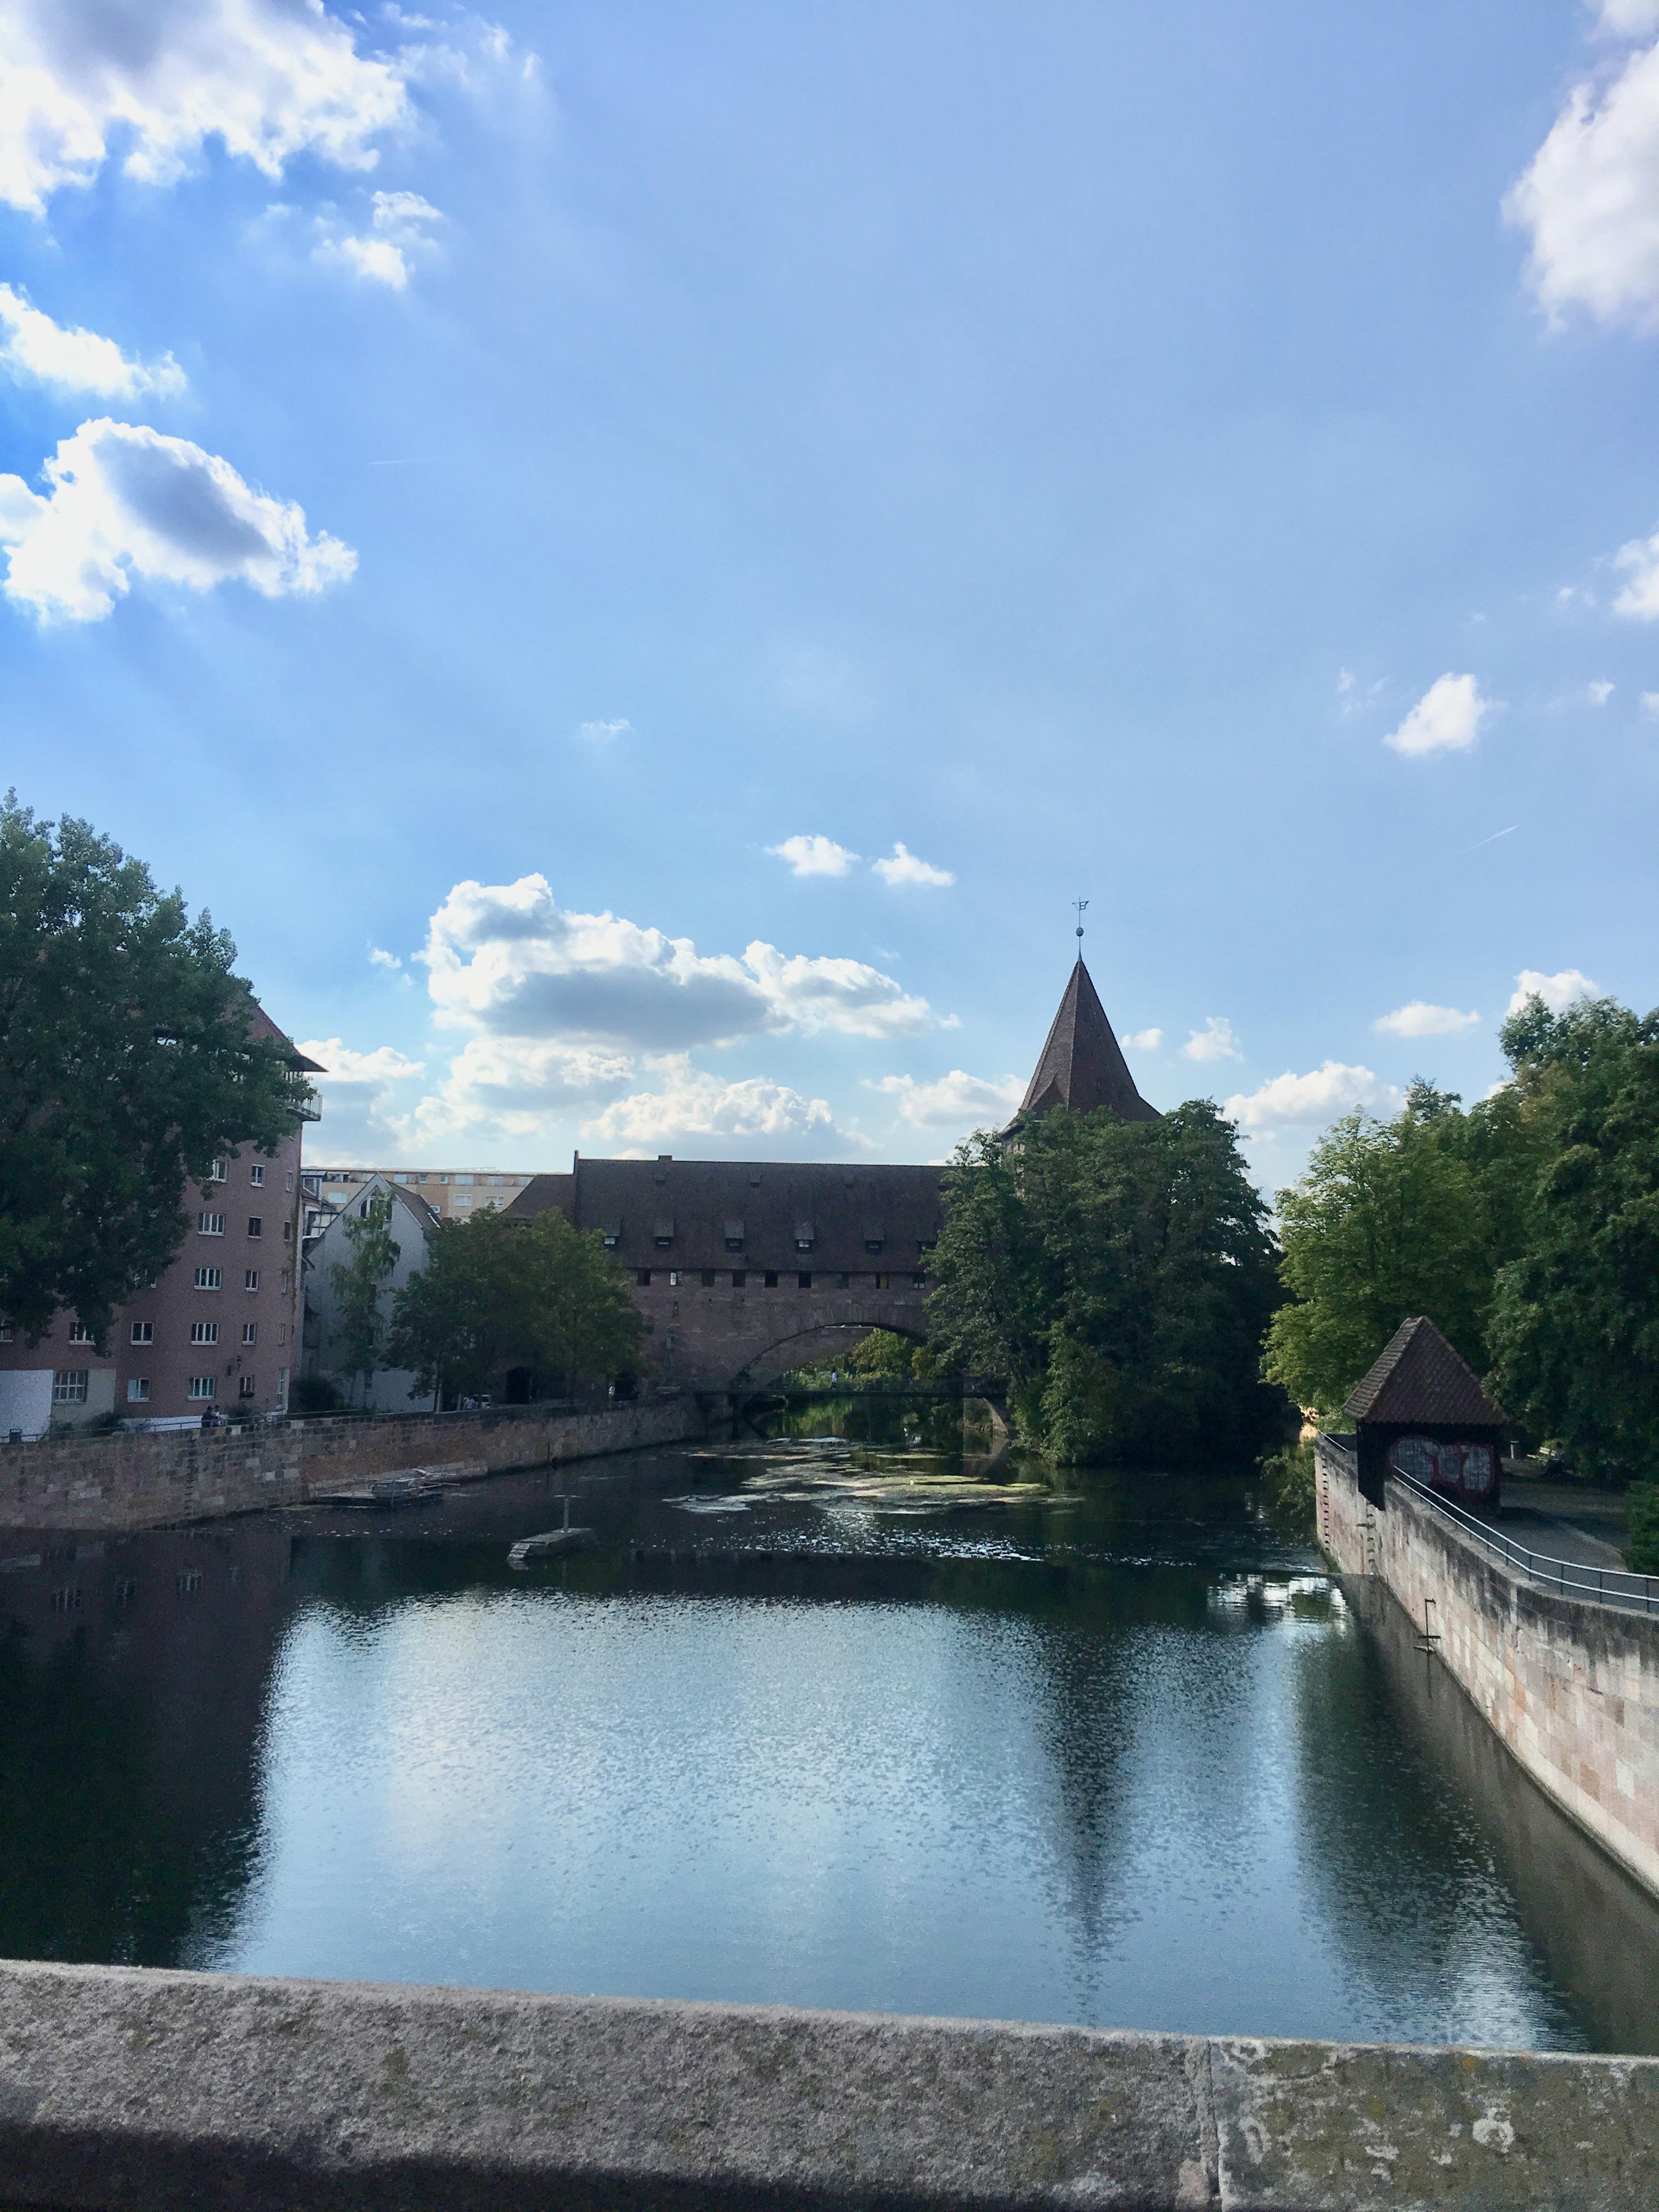 Nuremberg in Germany: Medieval town with history.